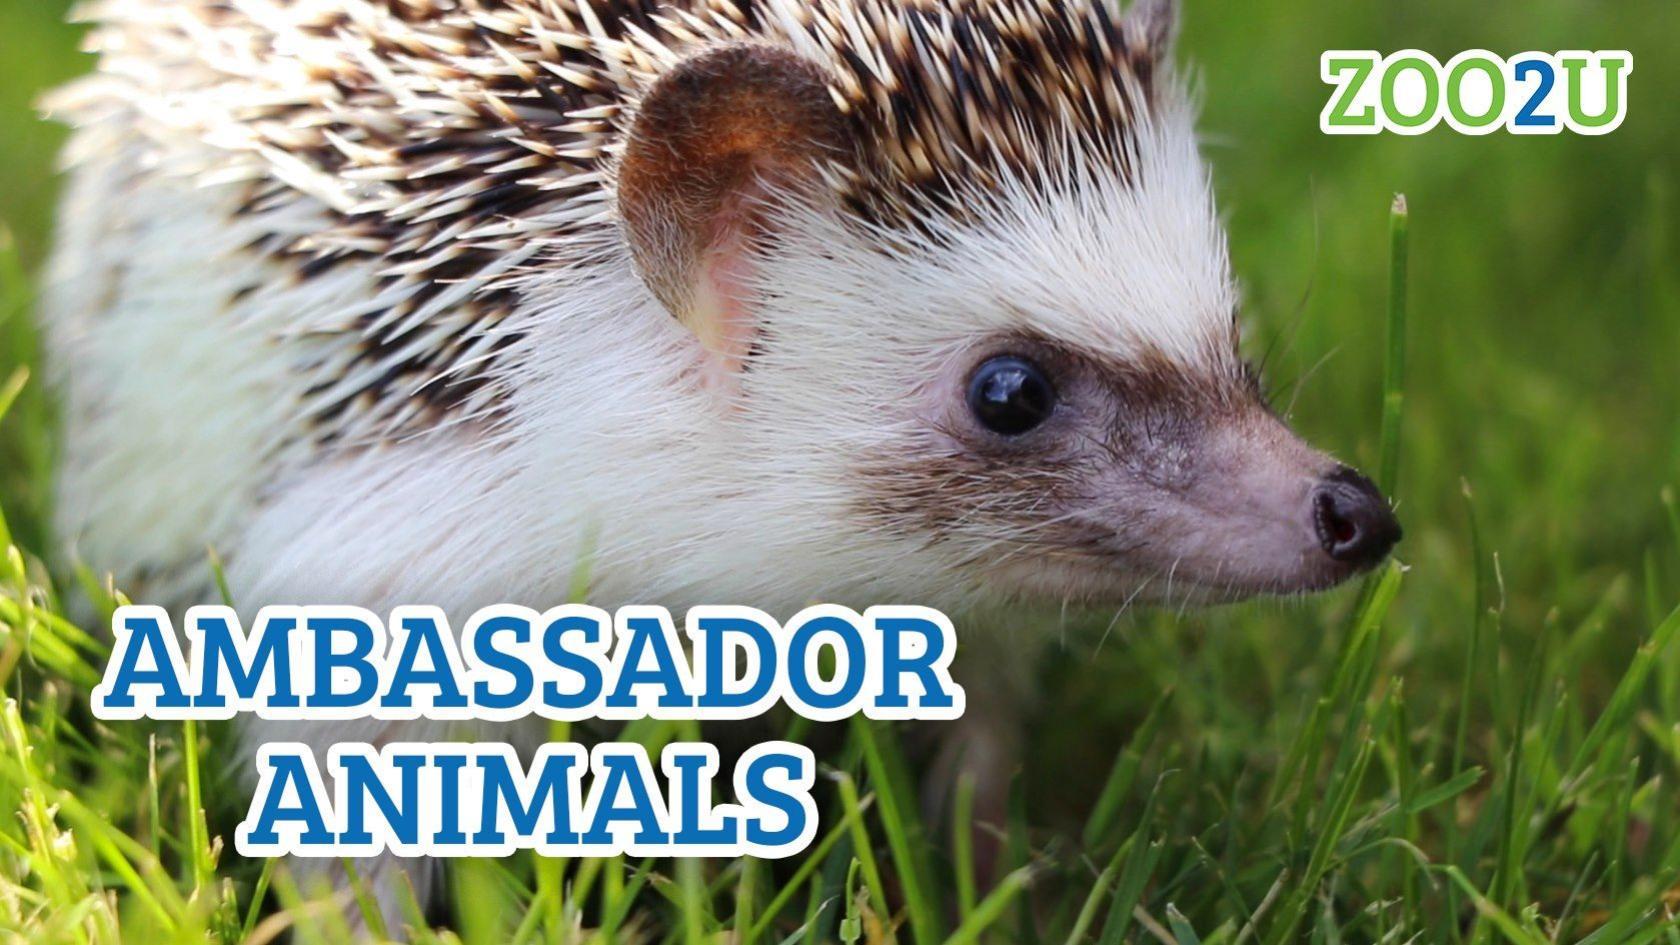 ambassador animals button